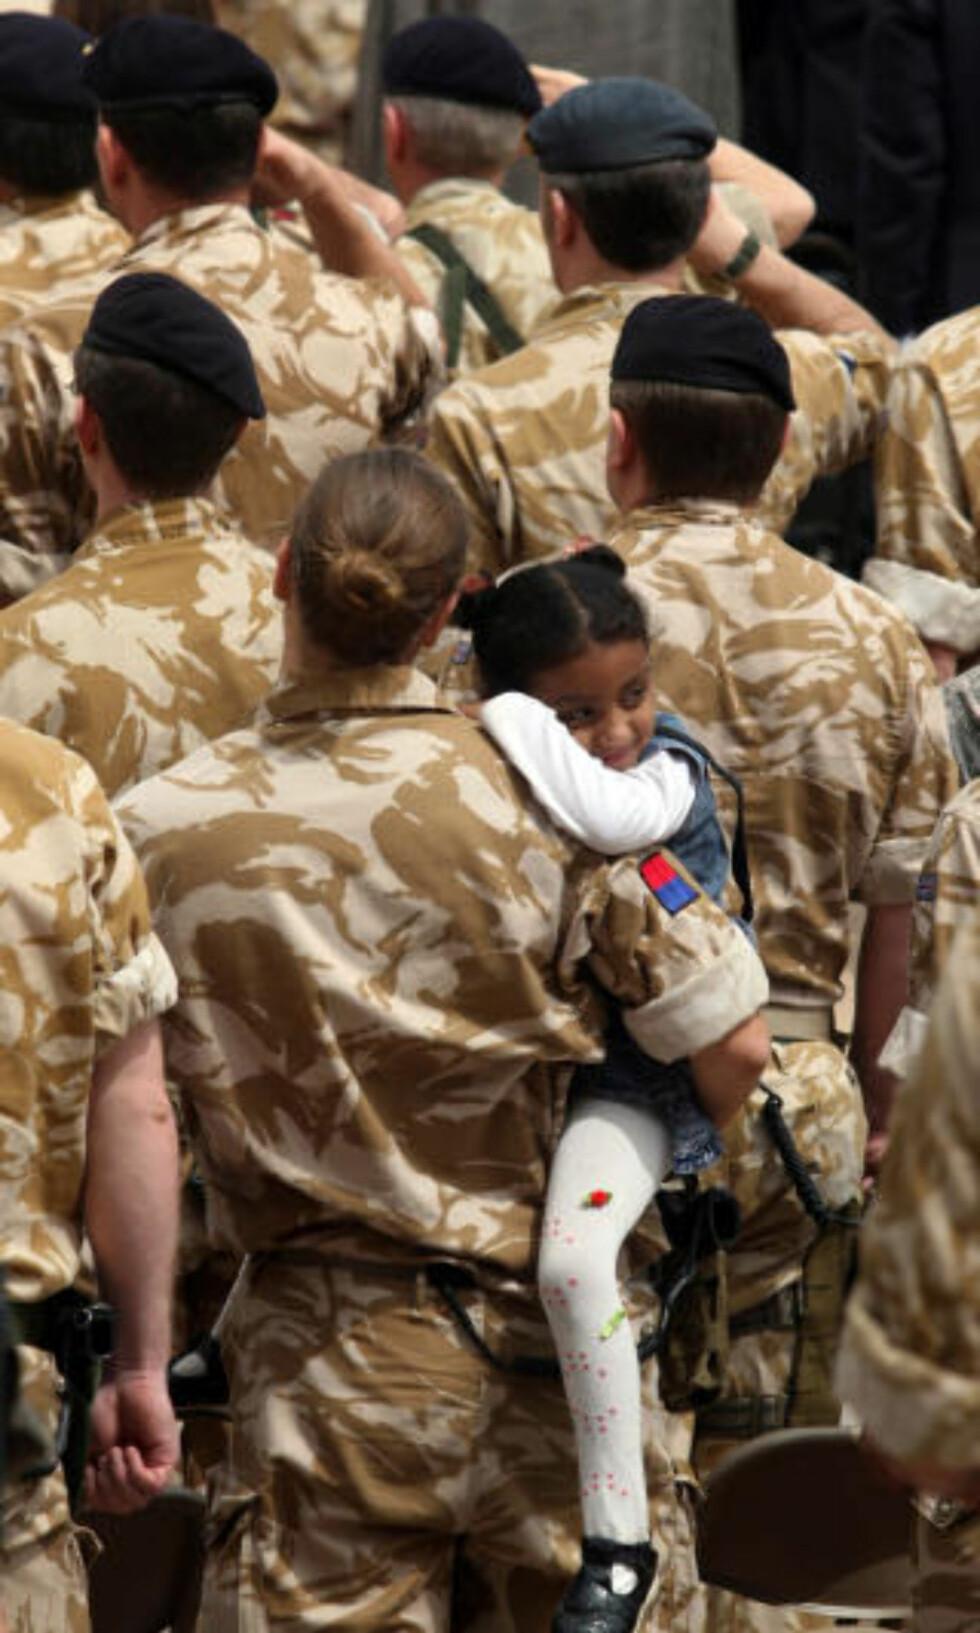 LOKAL PÅ BESØK: Britisk soldat holder et irakisk barn på armen under sermonien. Foto: ESSAM AL-SUDANI/AFP